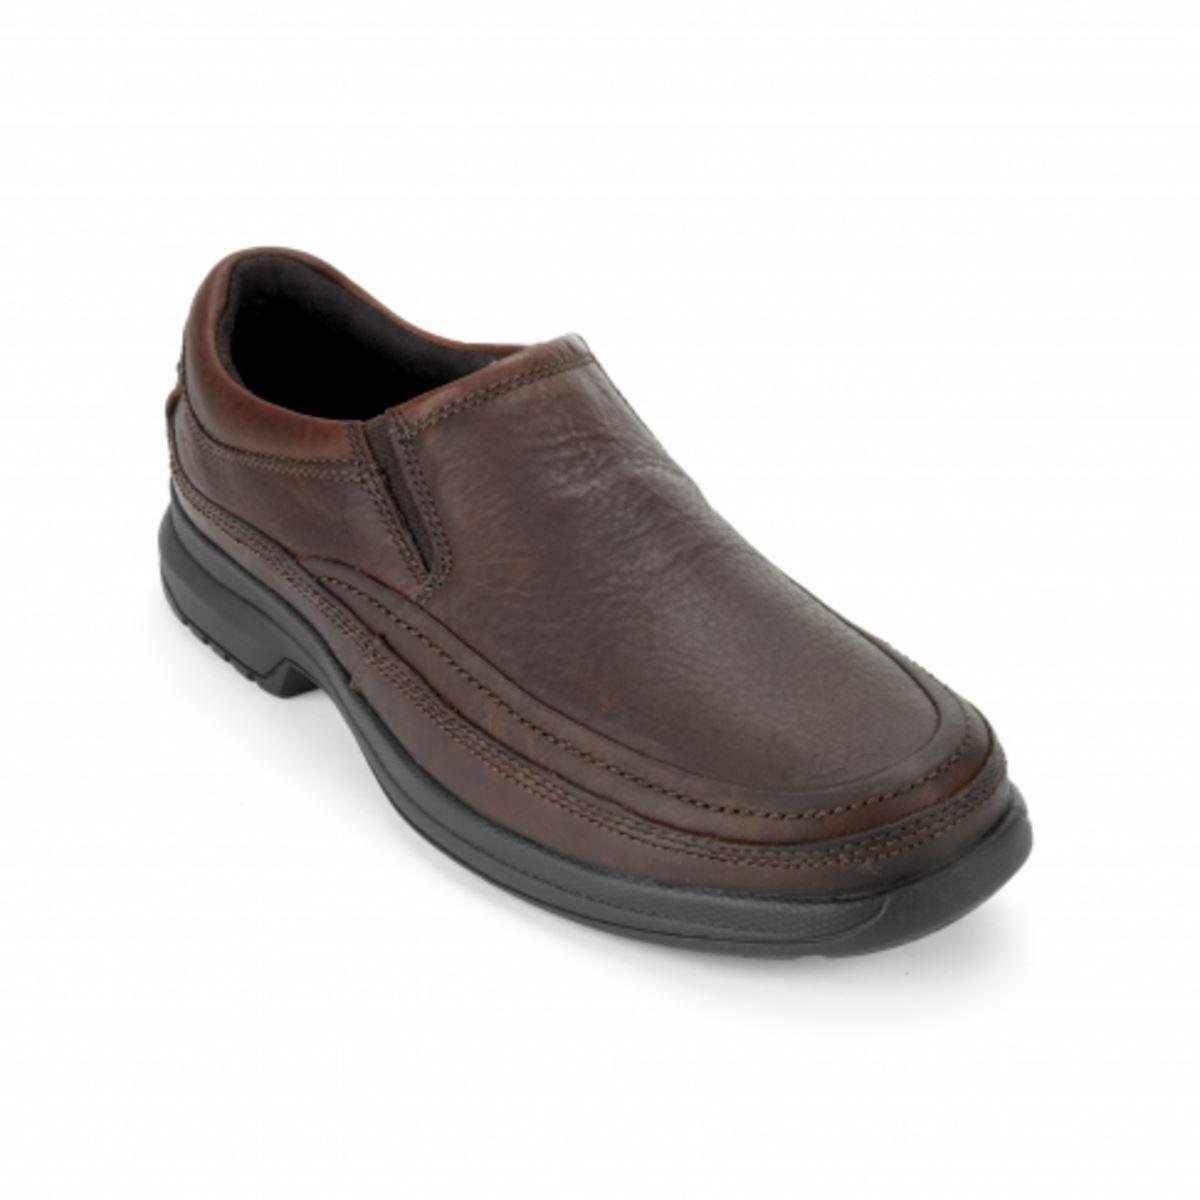 Homme Rockport Moc Slip On Dark Tan Mocassin Chaussures K58511